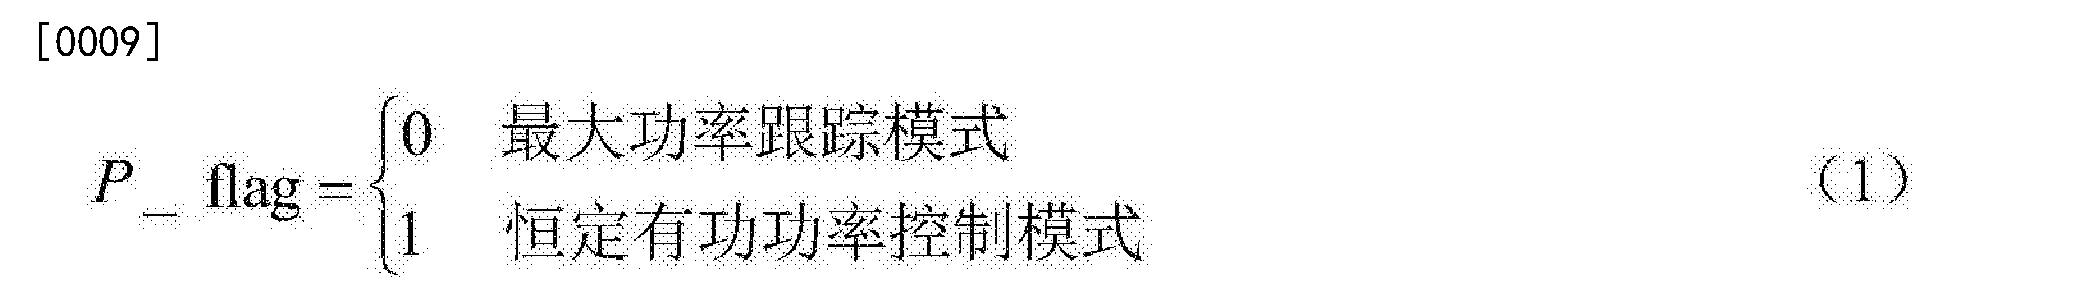 Figure CN107453389AD00061